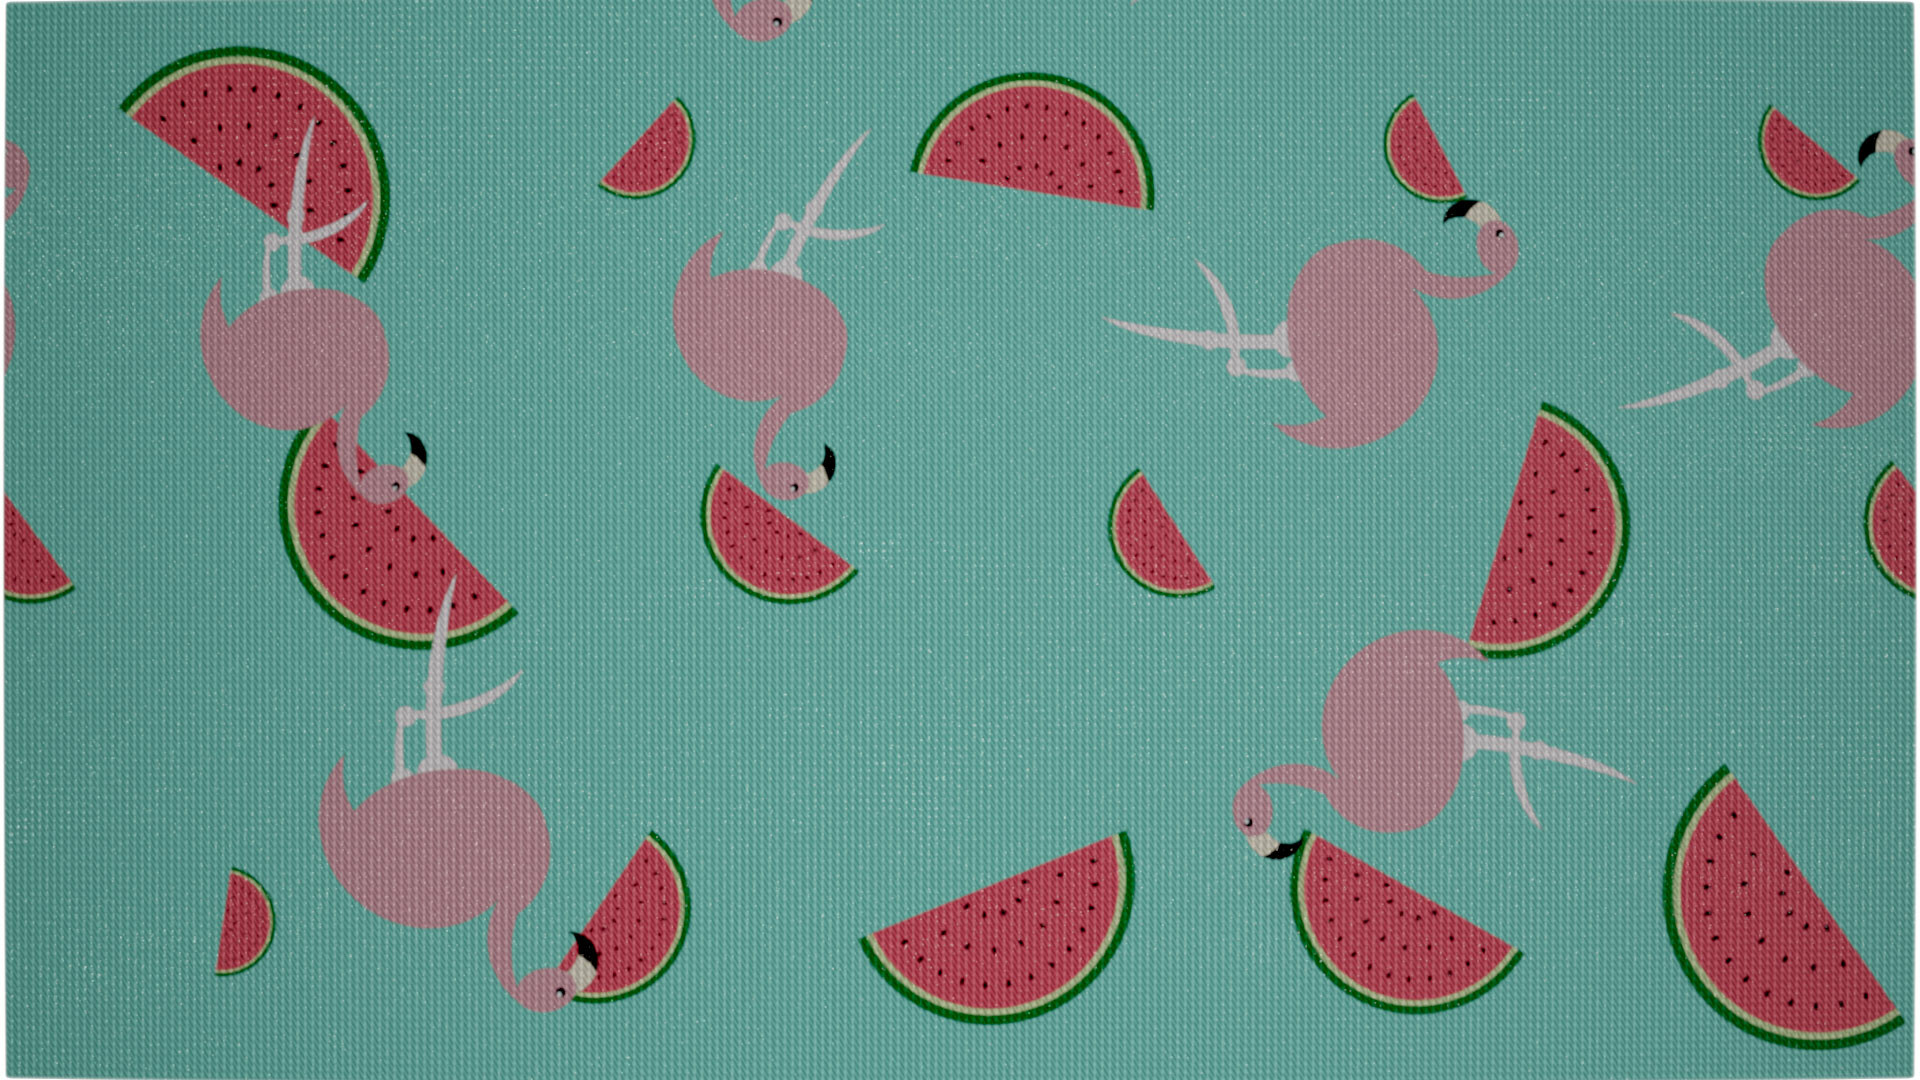 Rafael a pena maduro topwatermelons